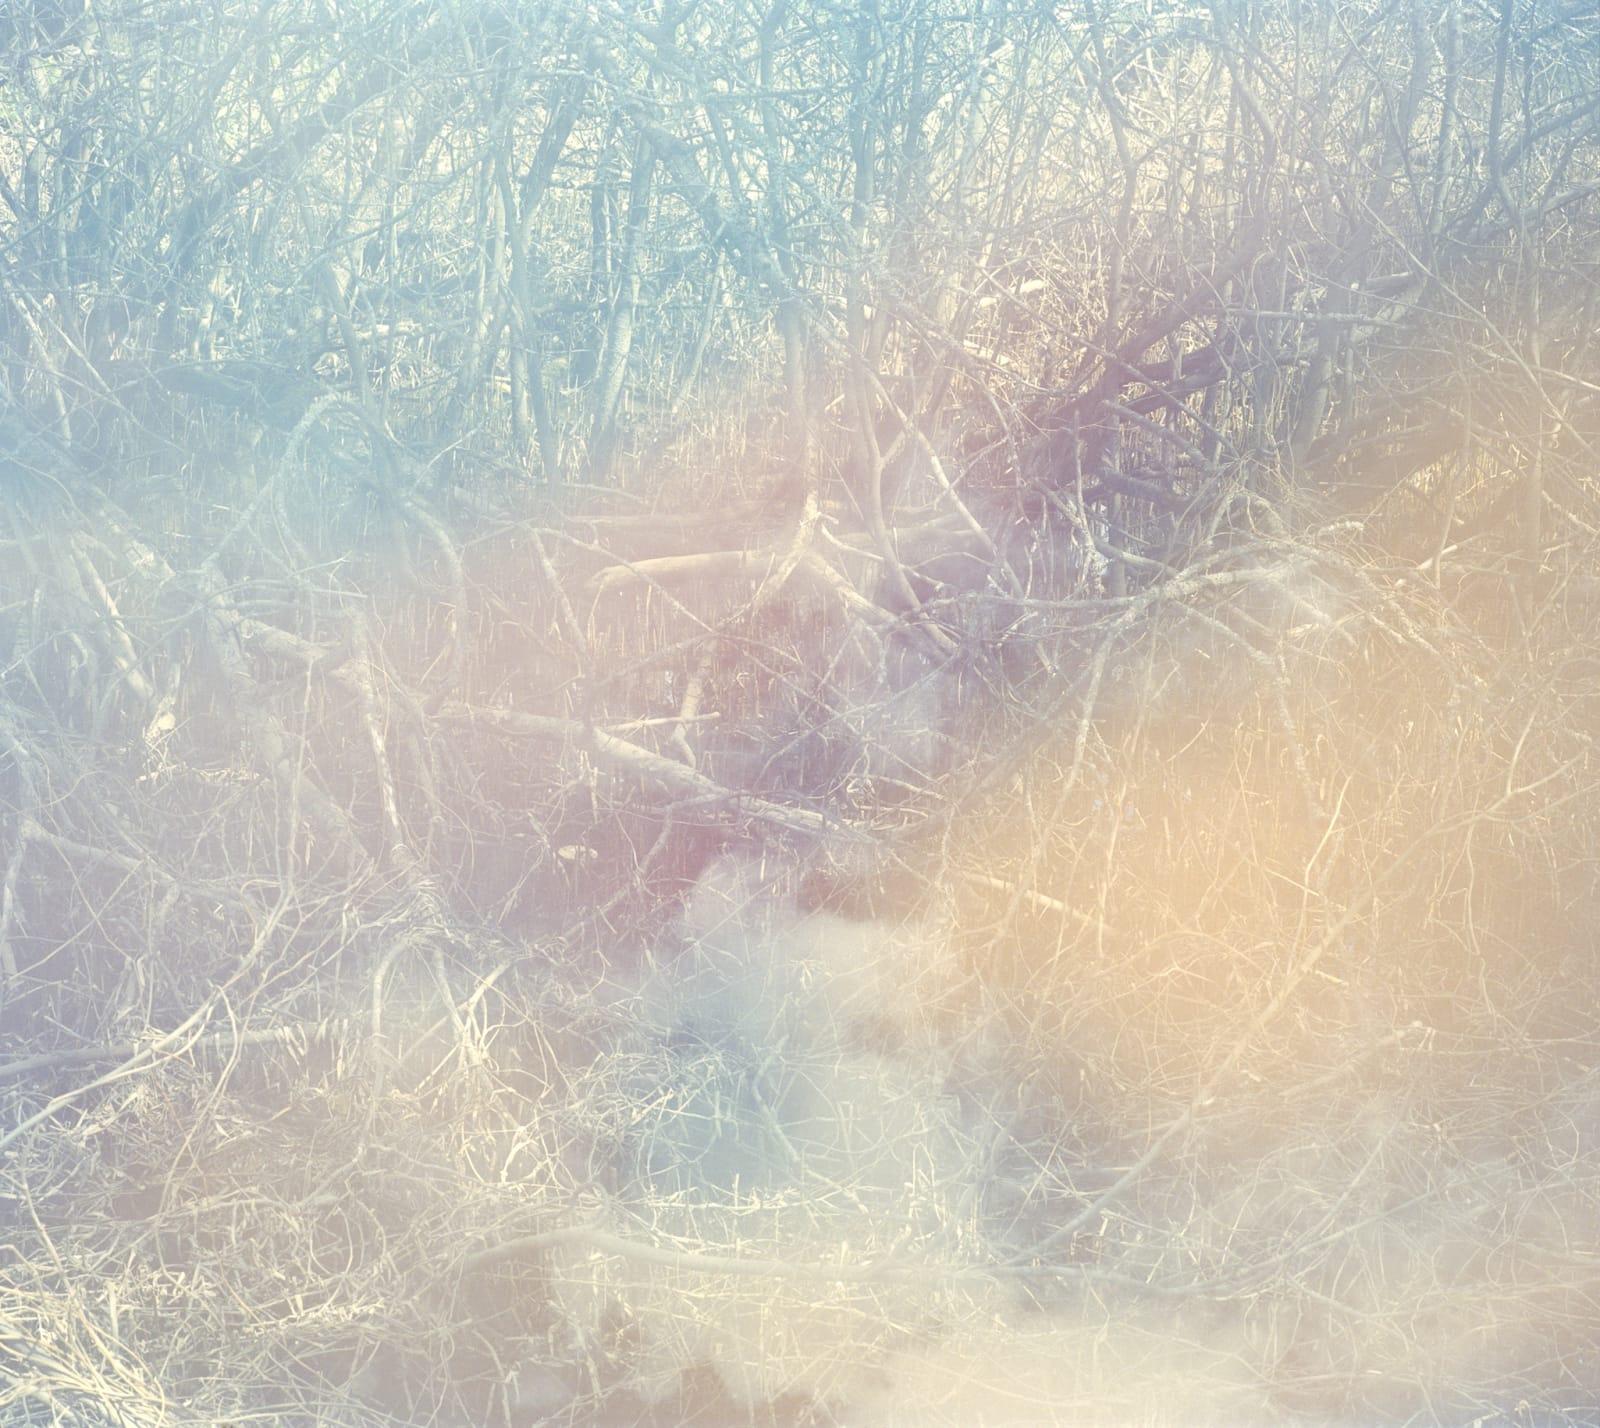 Erle M. Kyllingmark YDASSA #09, 2020 Analoge C-Print Image size: 94 x 105,5 cm Framed size: 97 x 108,5 cm Edition of 5 plus 2 artist's proofs